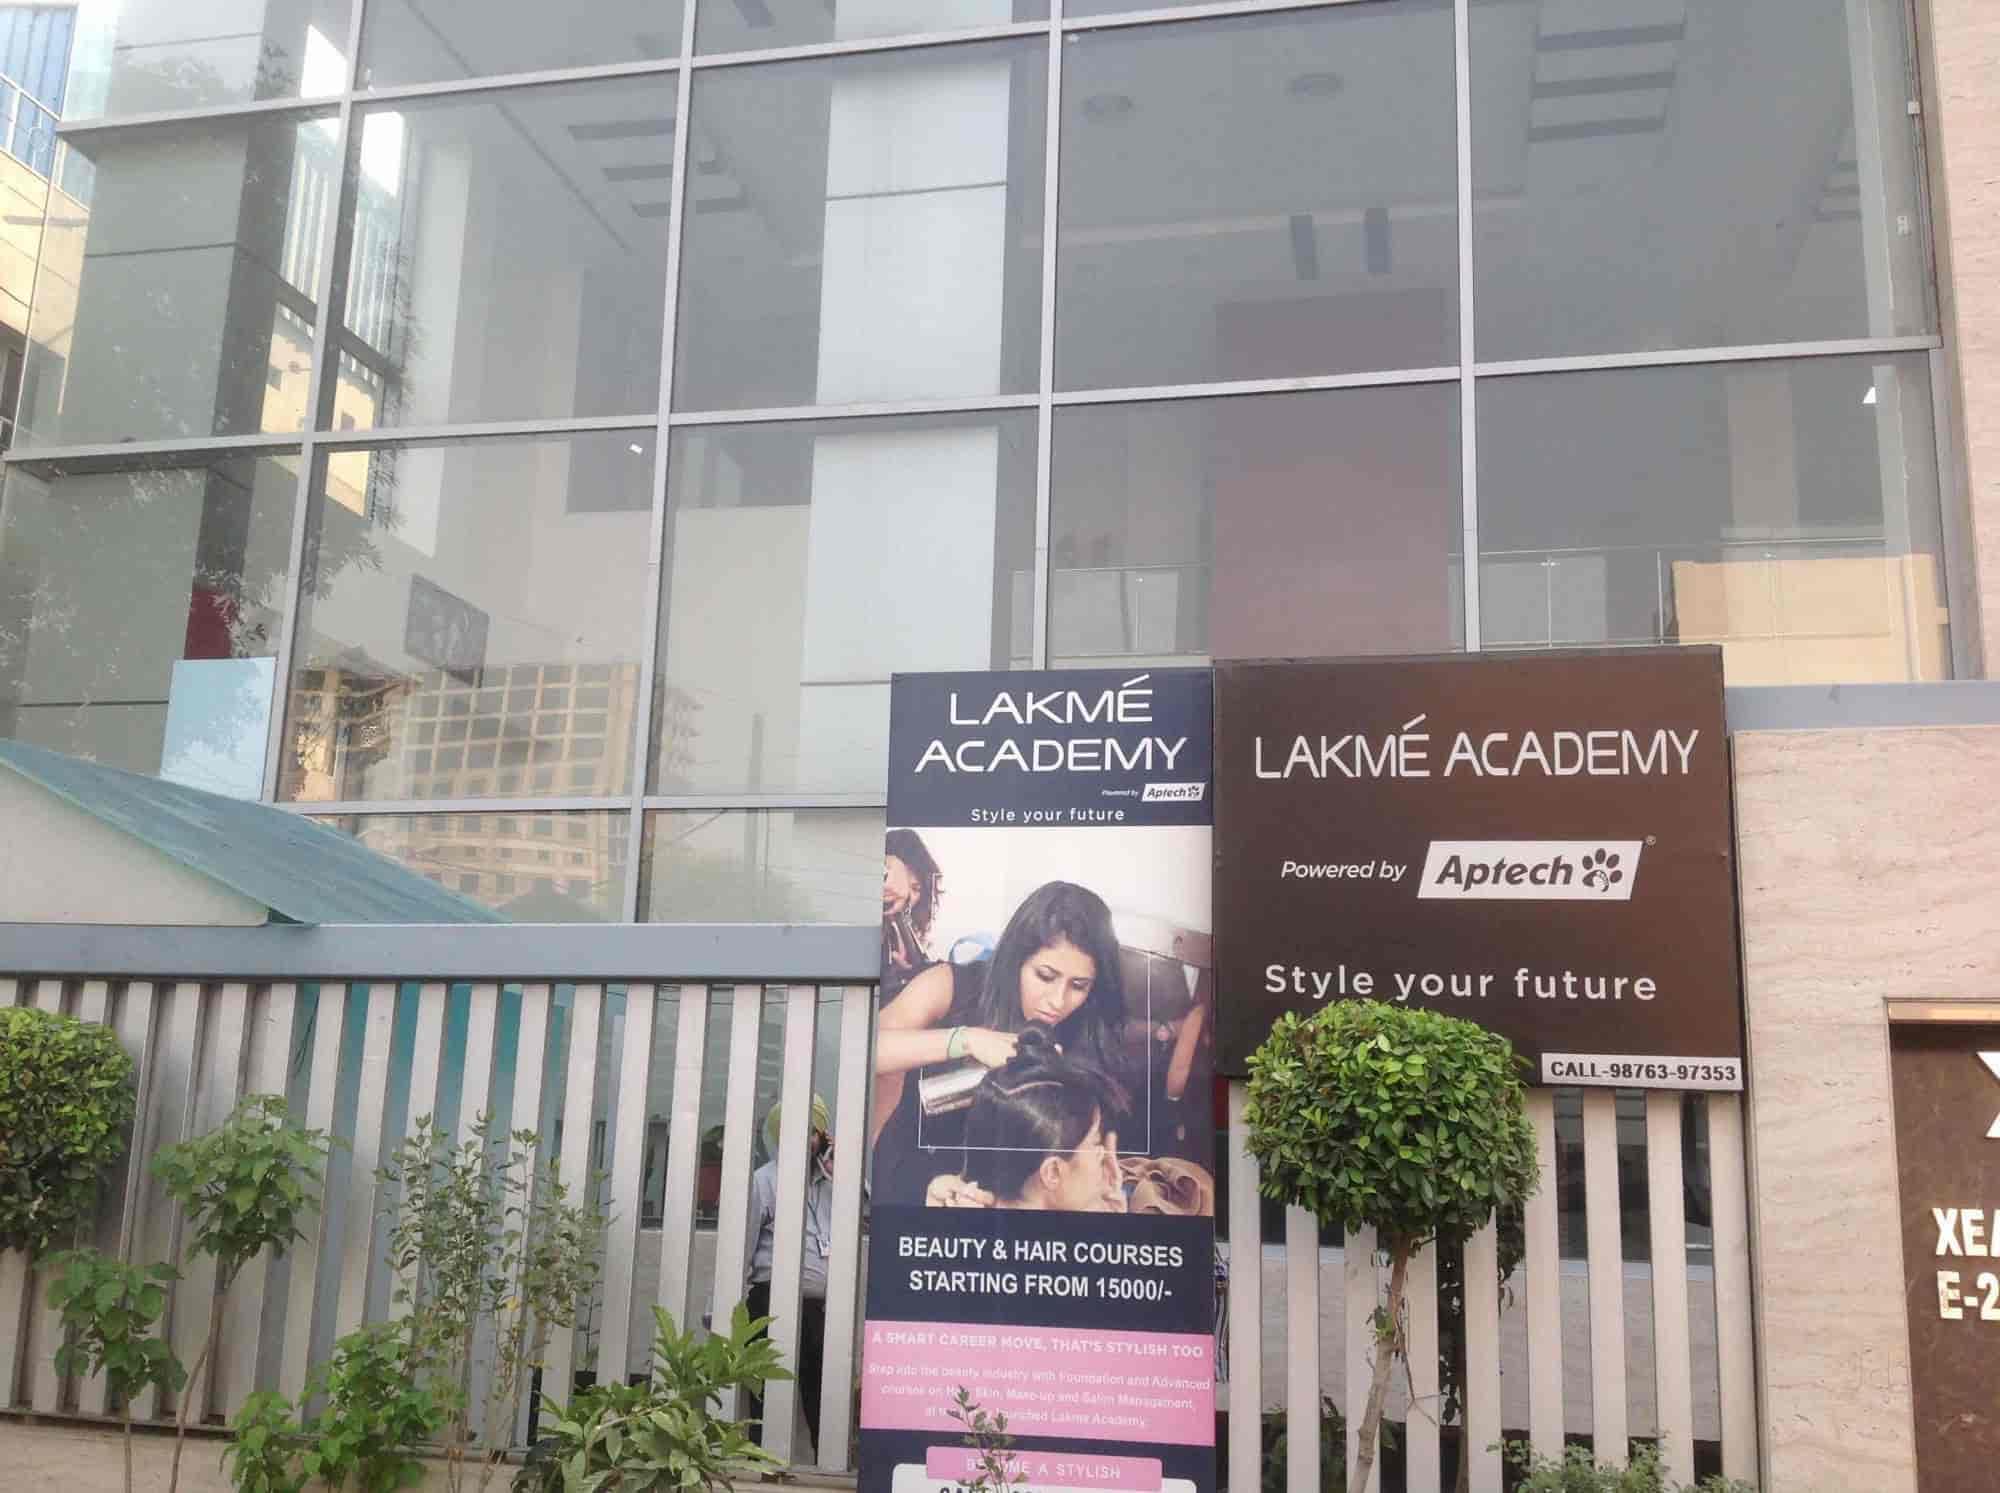 Lakme Academy Mohali, Industrial Area Phase 8 - Beauty